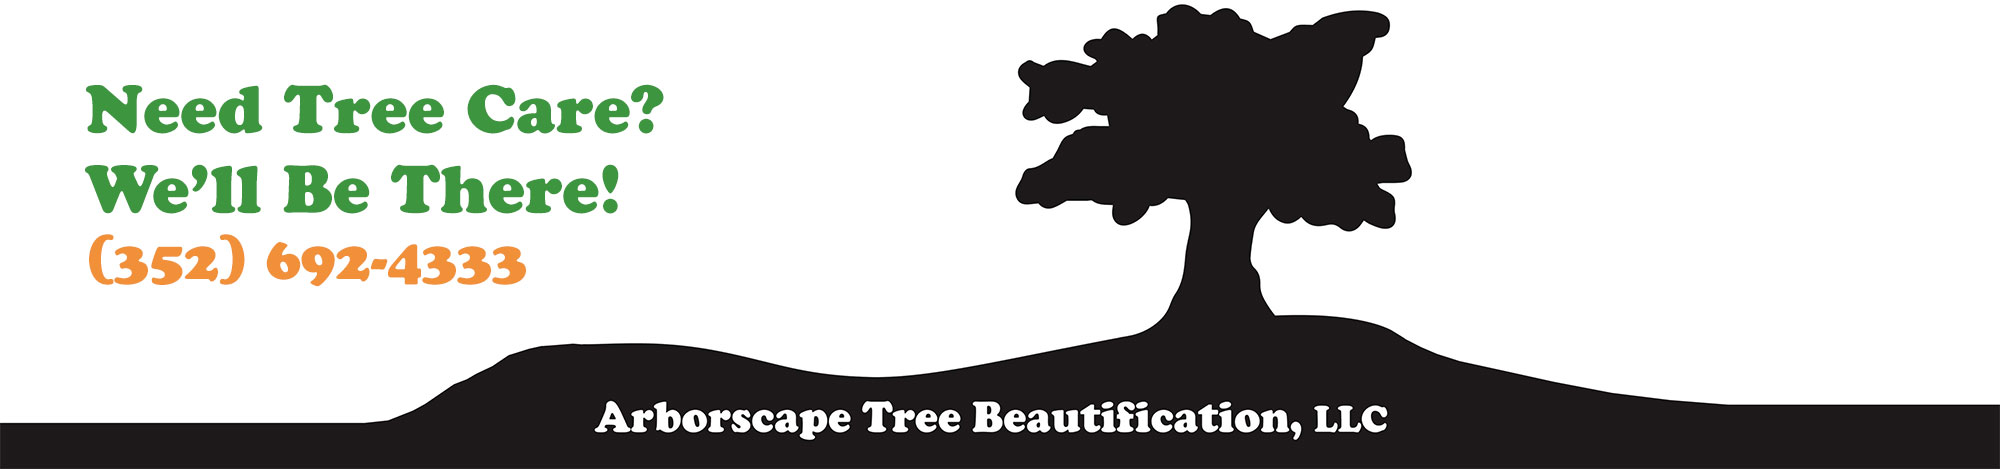 Arborscape Tree Beautification LLC